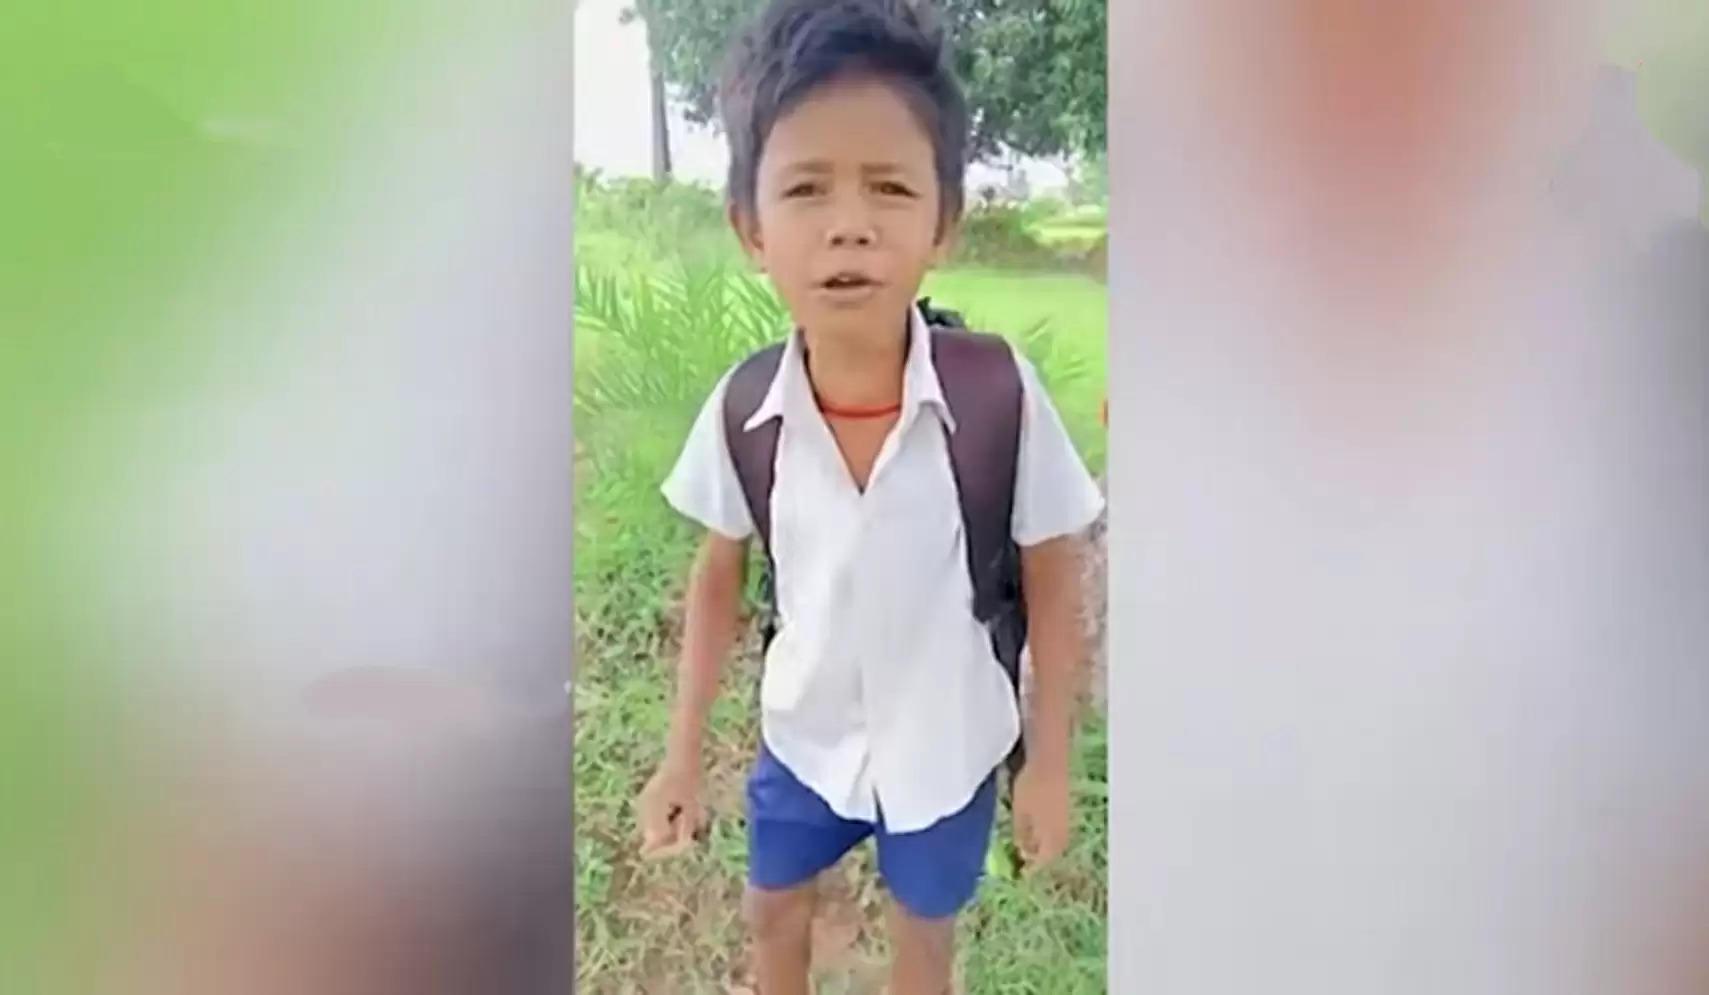 Viral boy